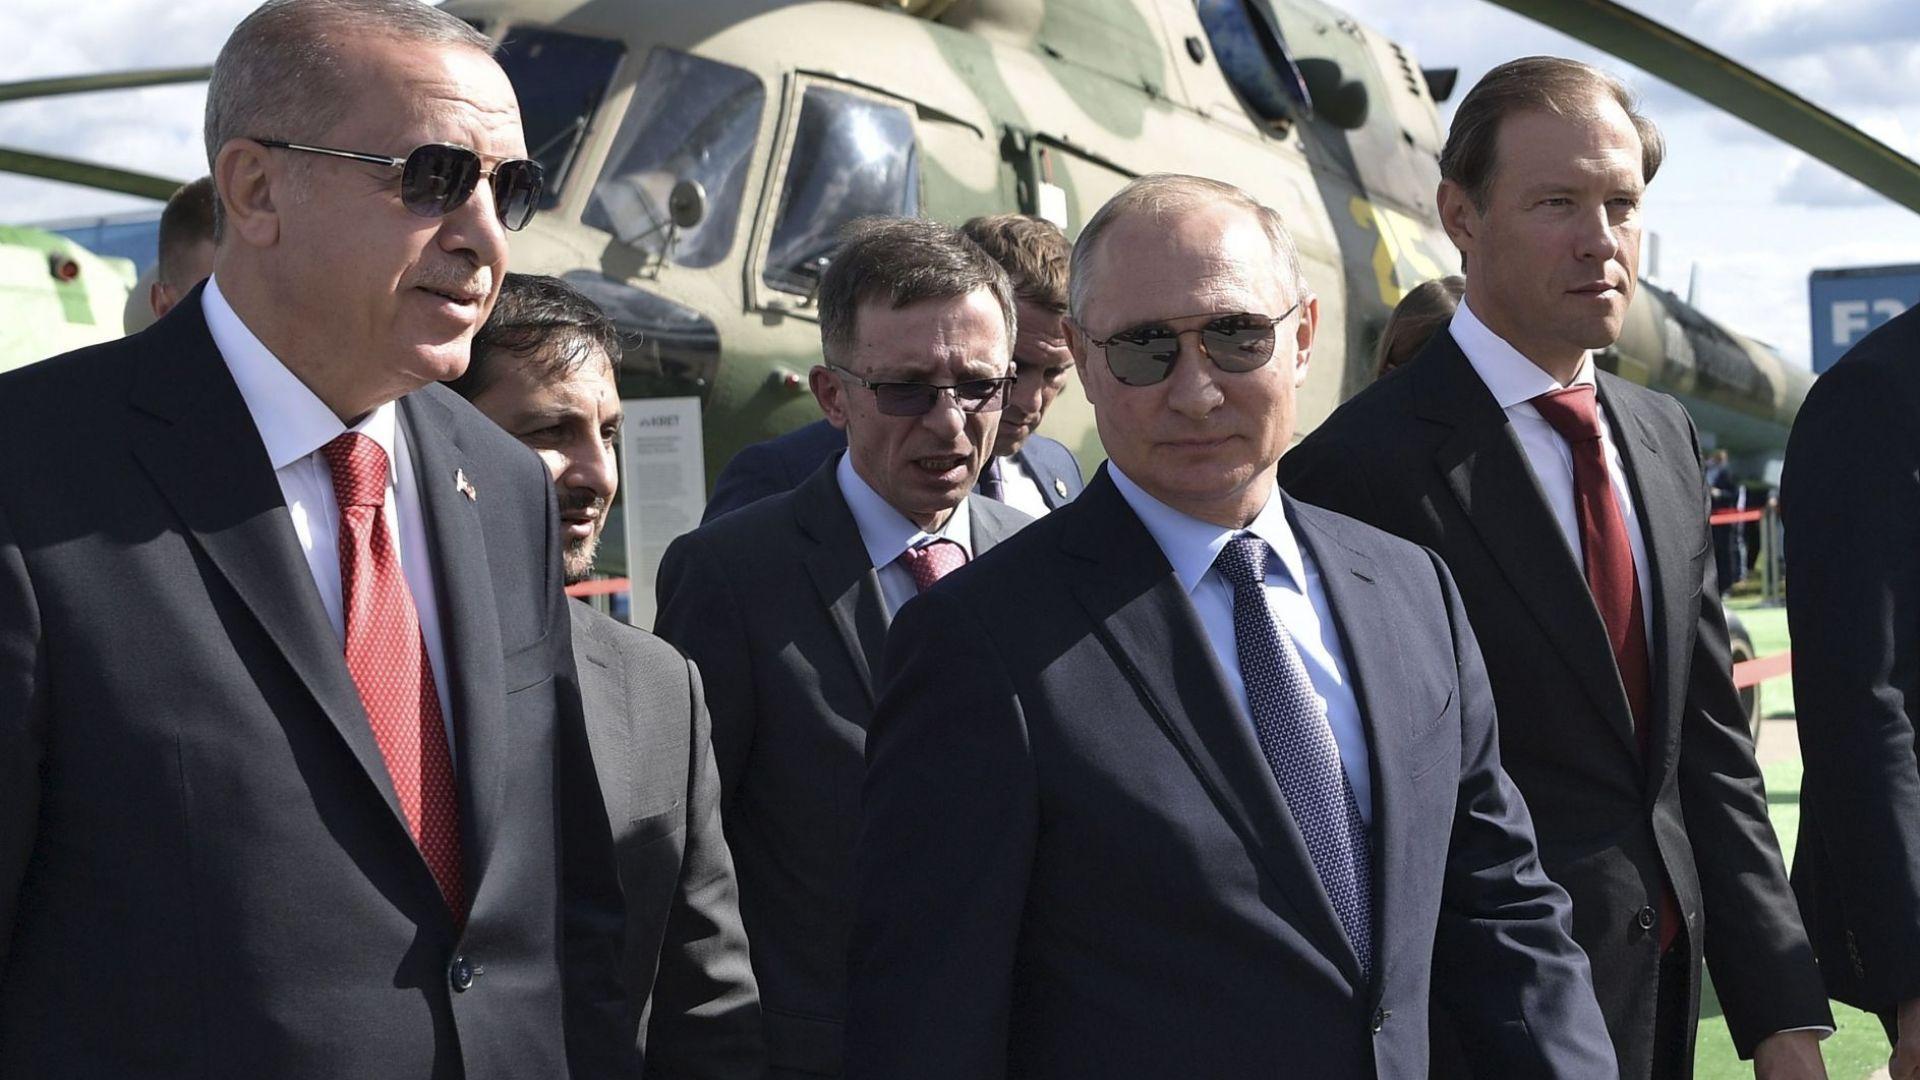 Президентът Реджеп Тайип Ердоган и руският президент Владимир Путин се